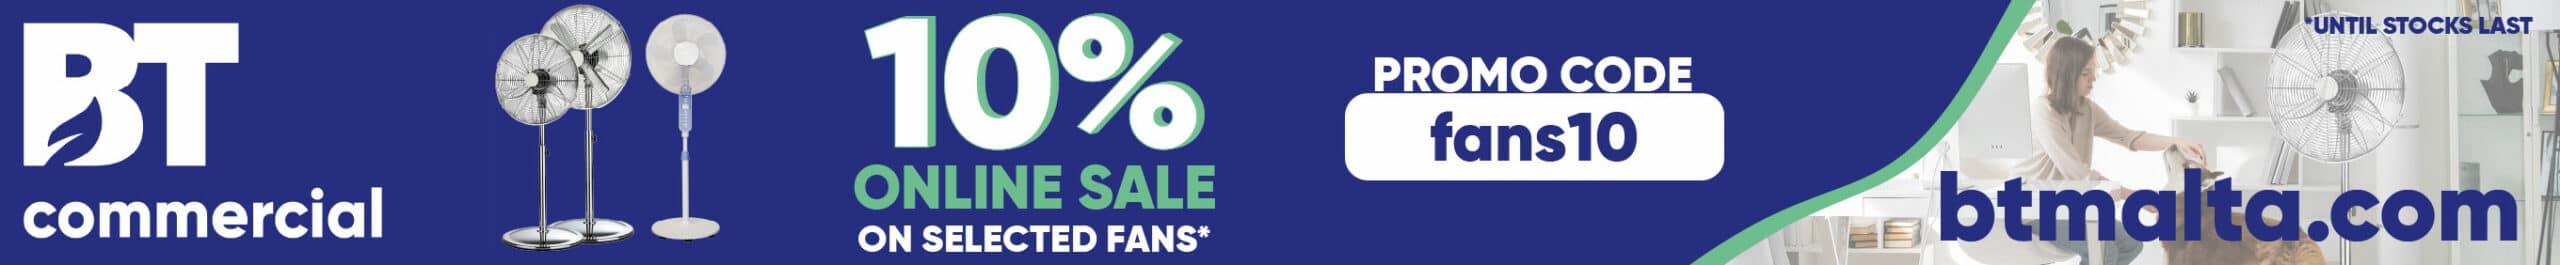 BT Commercial 10% Fans Leaderboard